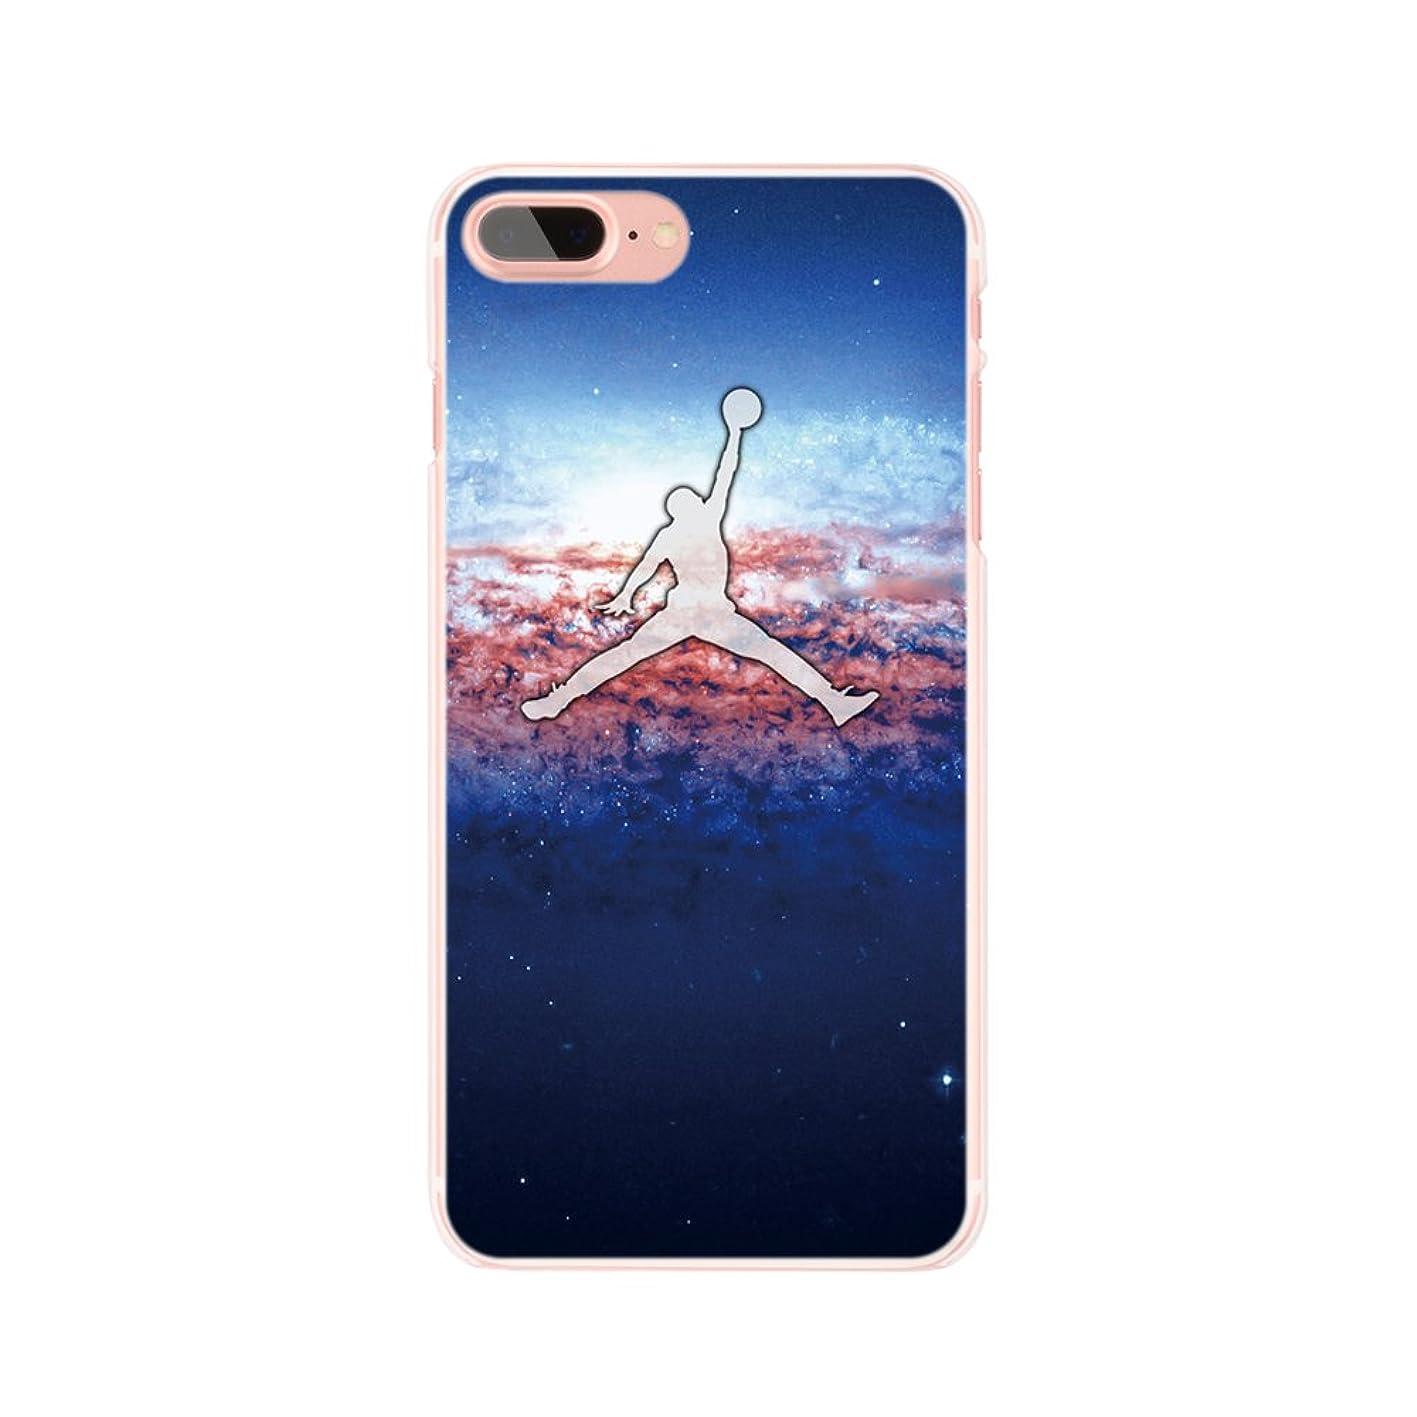 Desxz jordan 23 basketball cell phone Cover case for iphone 6 4 4s 5 5s SE 5c 6 6s 7 plus case for iphone 7 8 x - 71839 - for iphone 6S plus efbuybdfgvw588